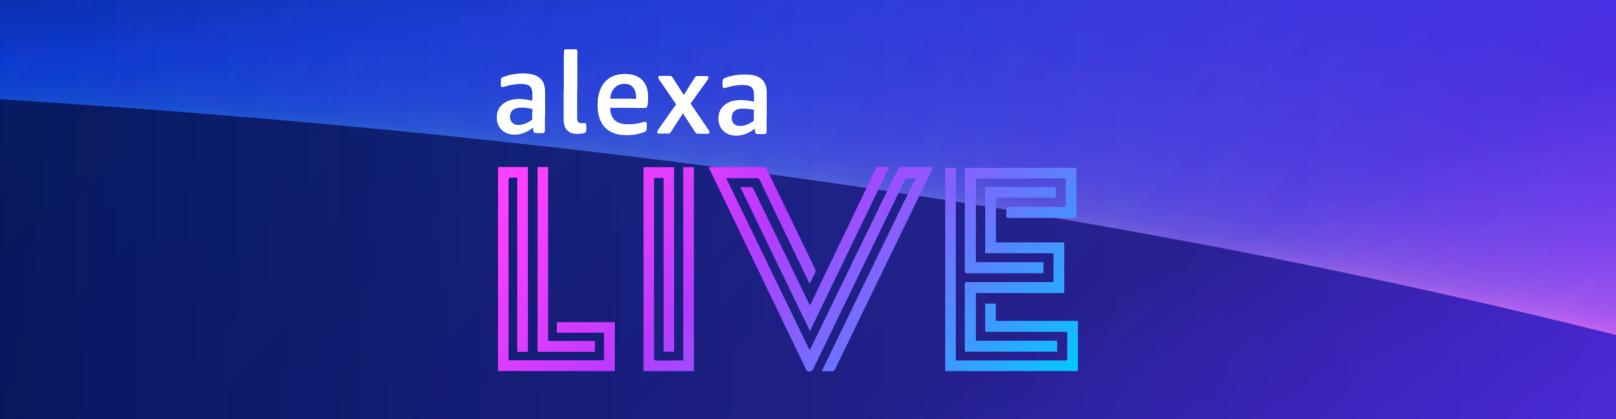 Was ist neu? Alexa Live Event 2021